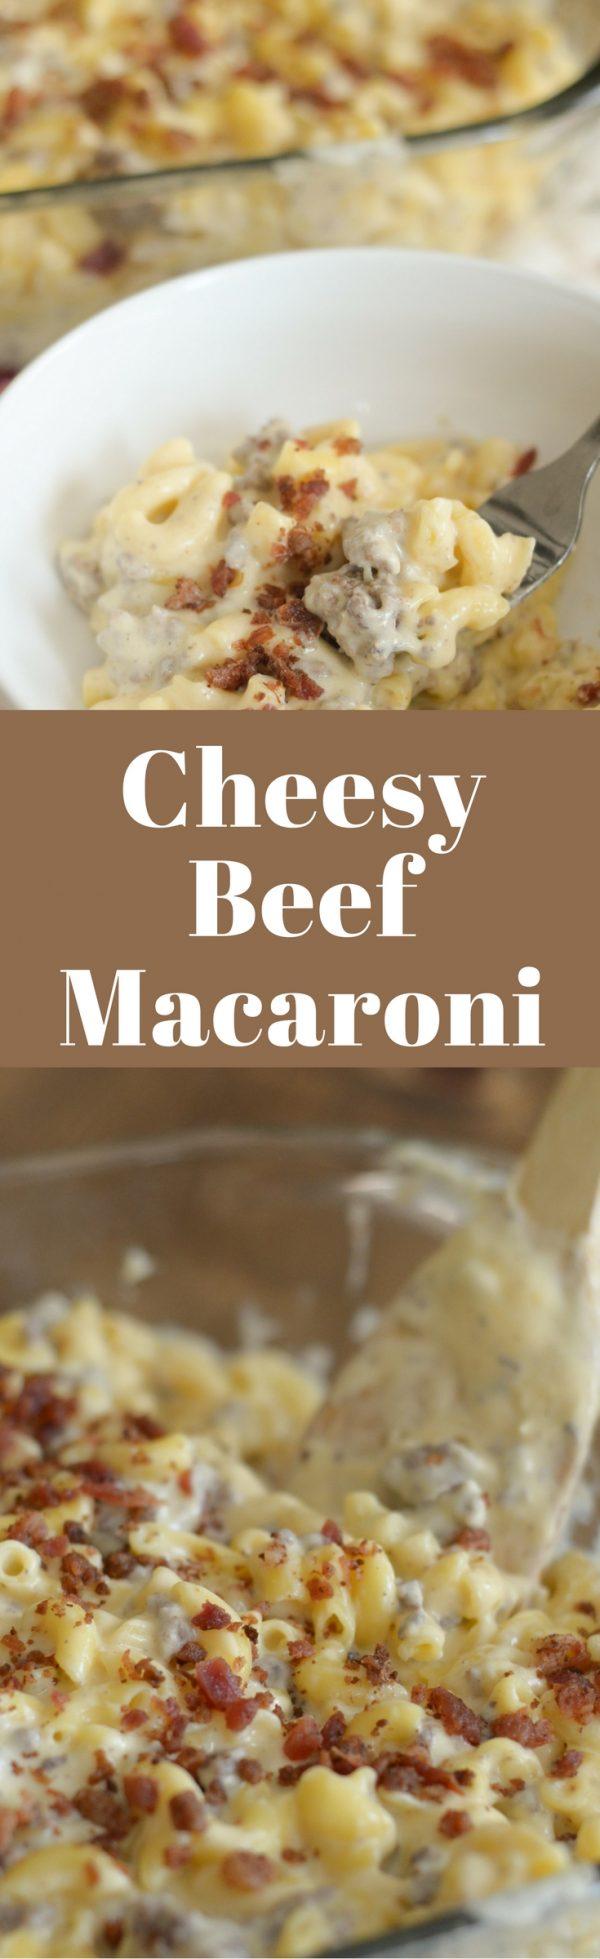 Gluten Free Beef Mac & Cheese